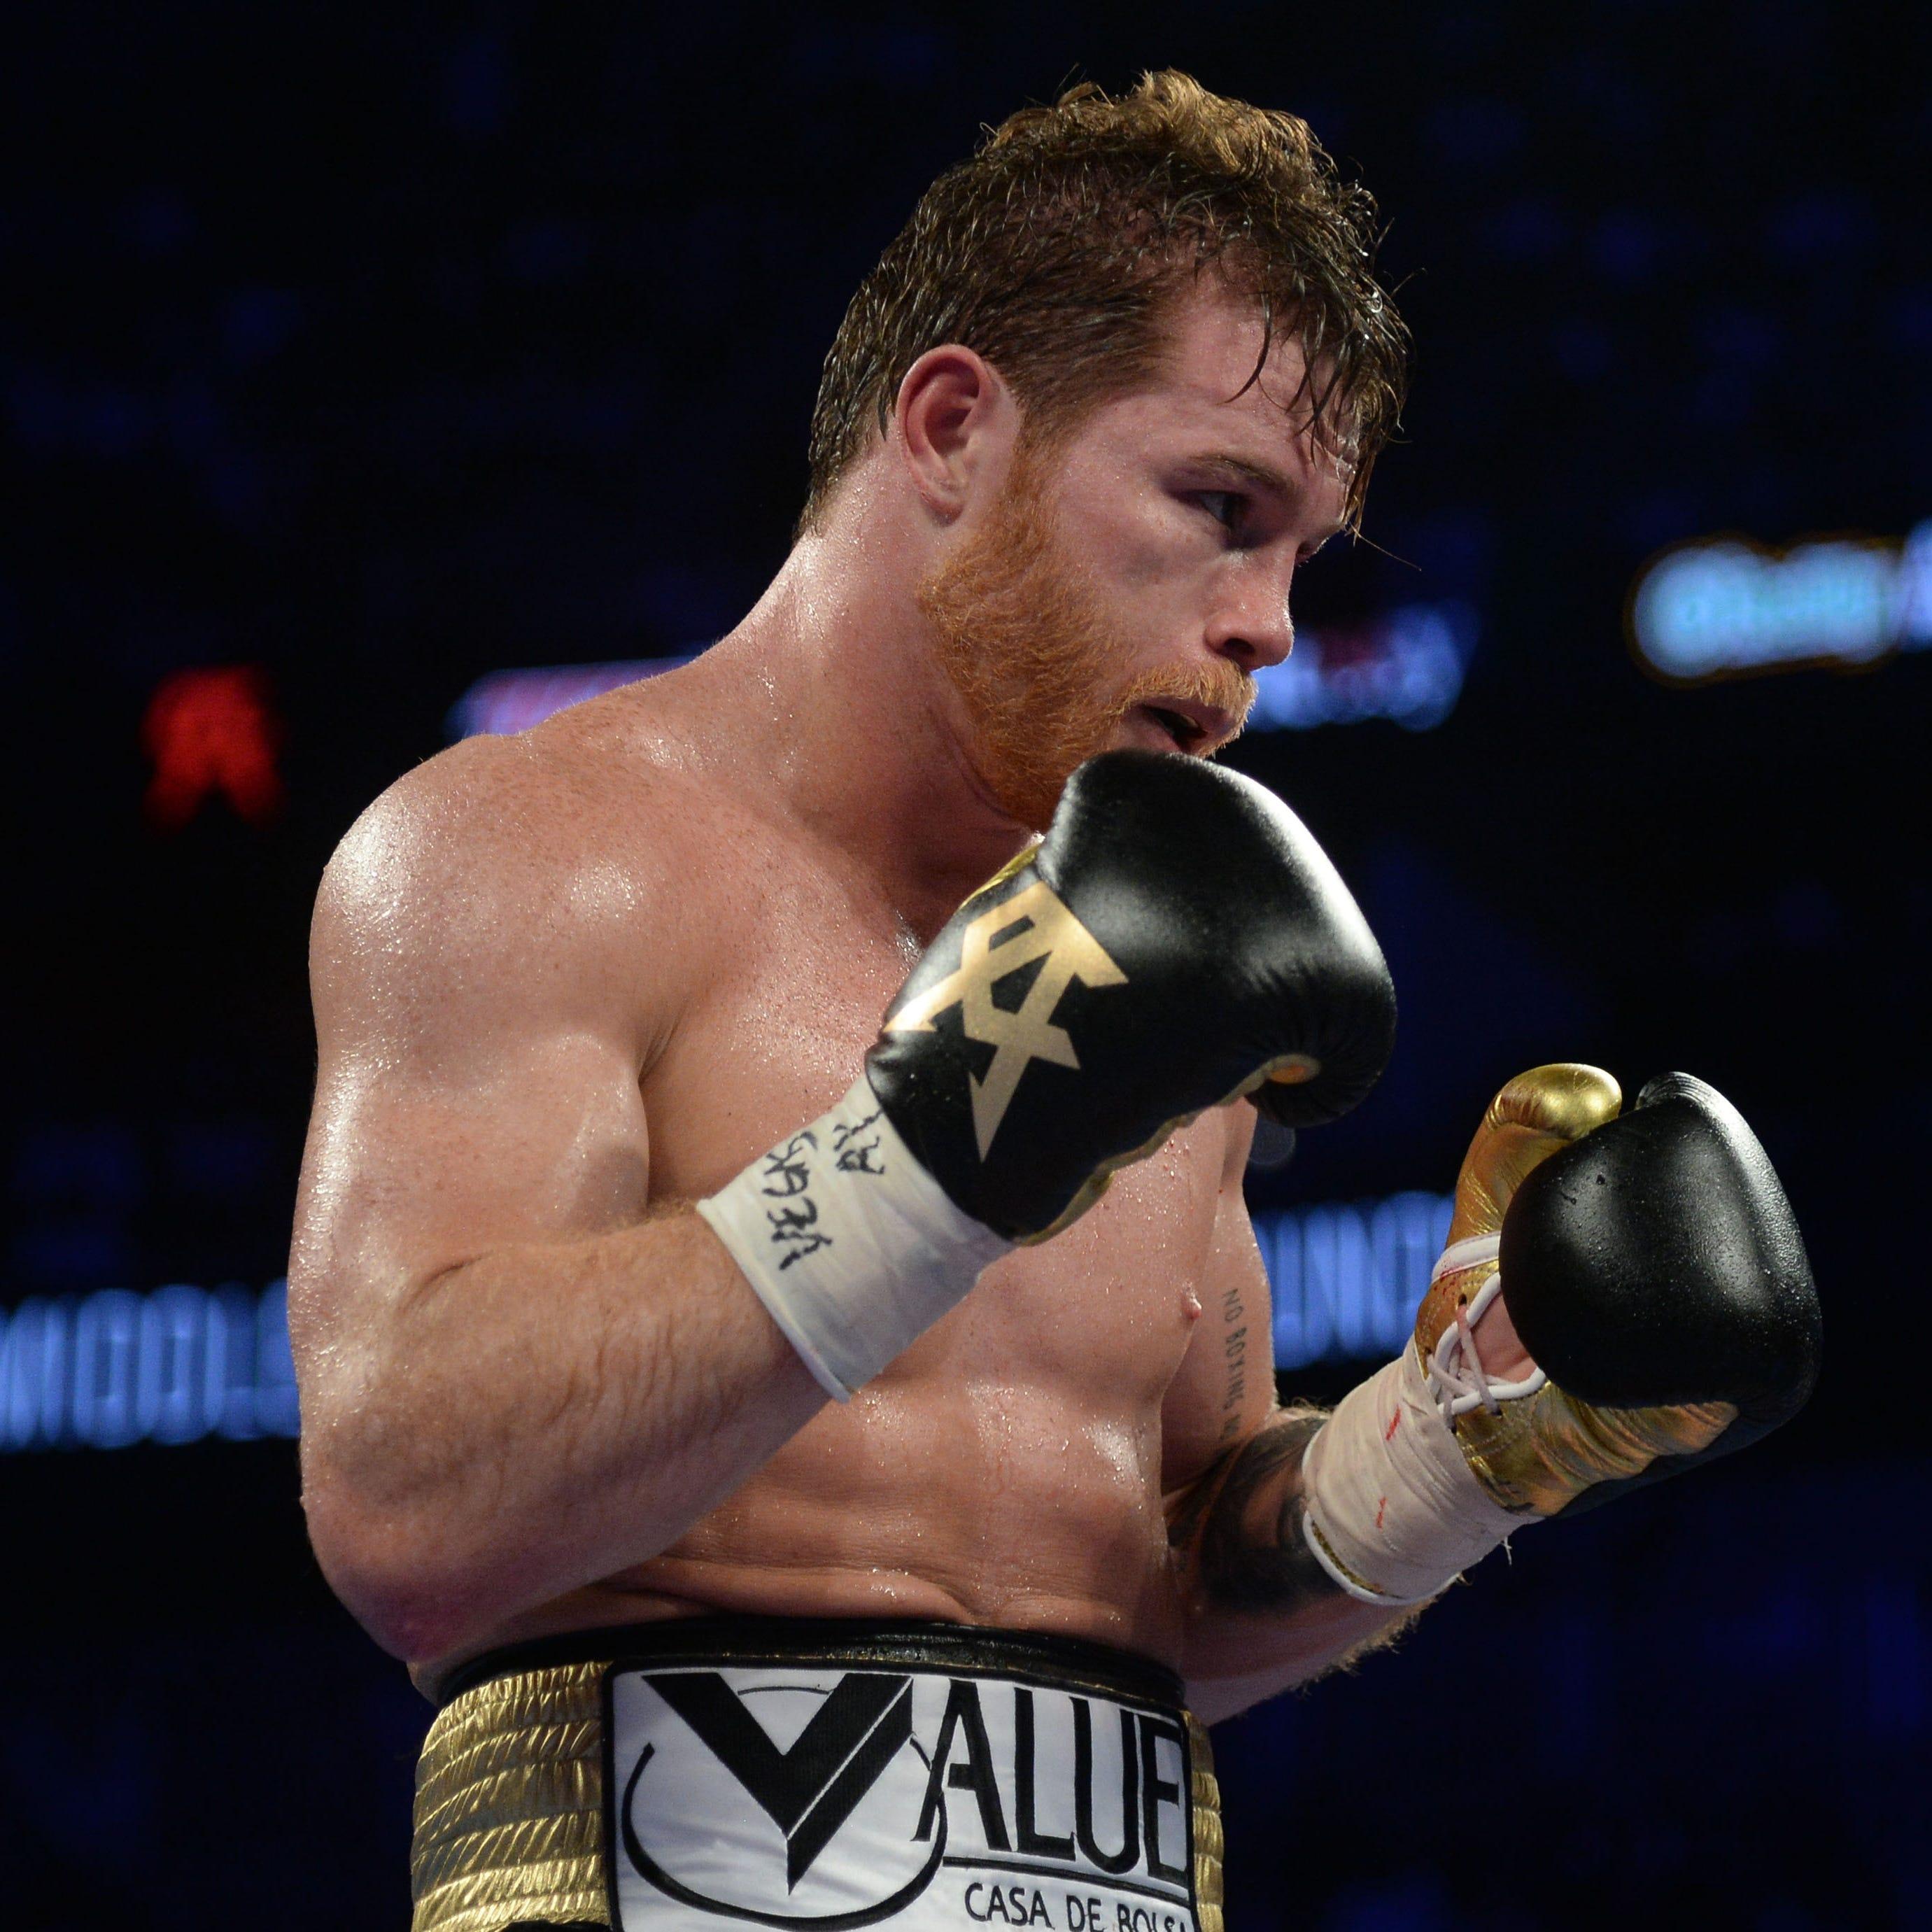 Canelo Alvarez's non-controversial win over Gennady Golovkin a bigger victory for boxing